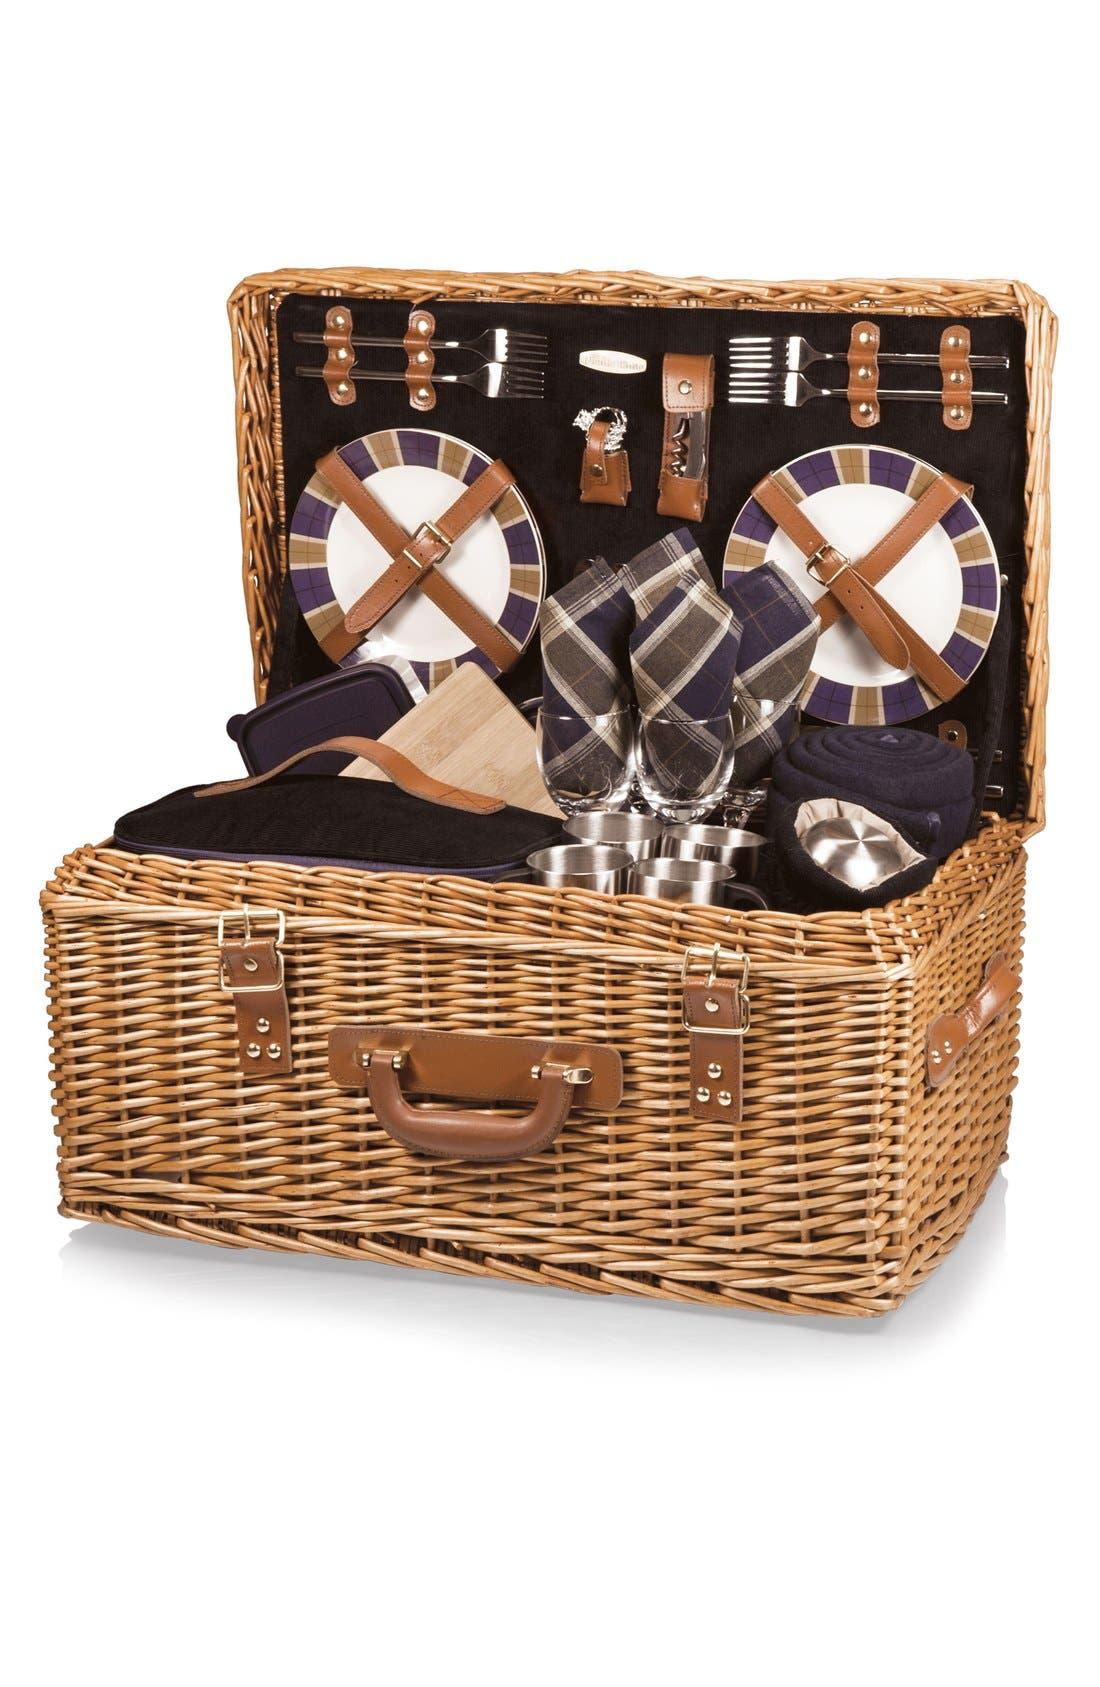 Alternate Image 1 Selected - Picnic Time 'Windsor' Wicker Picnic Basket